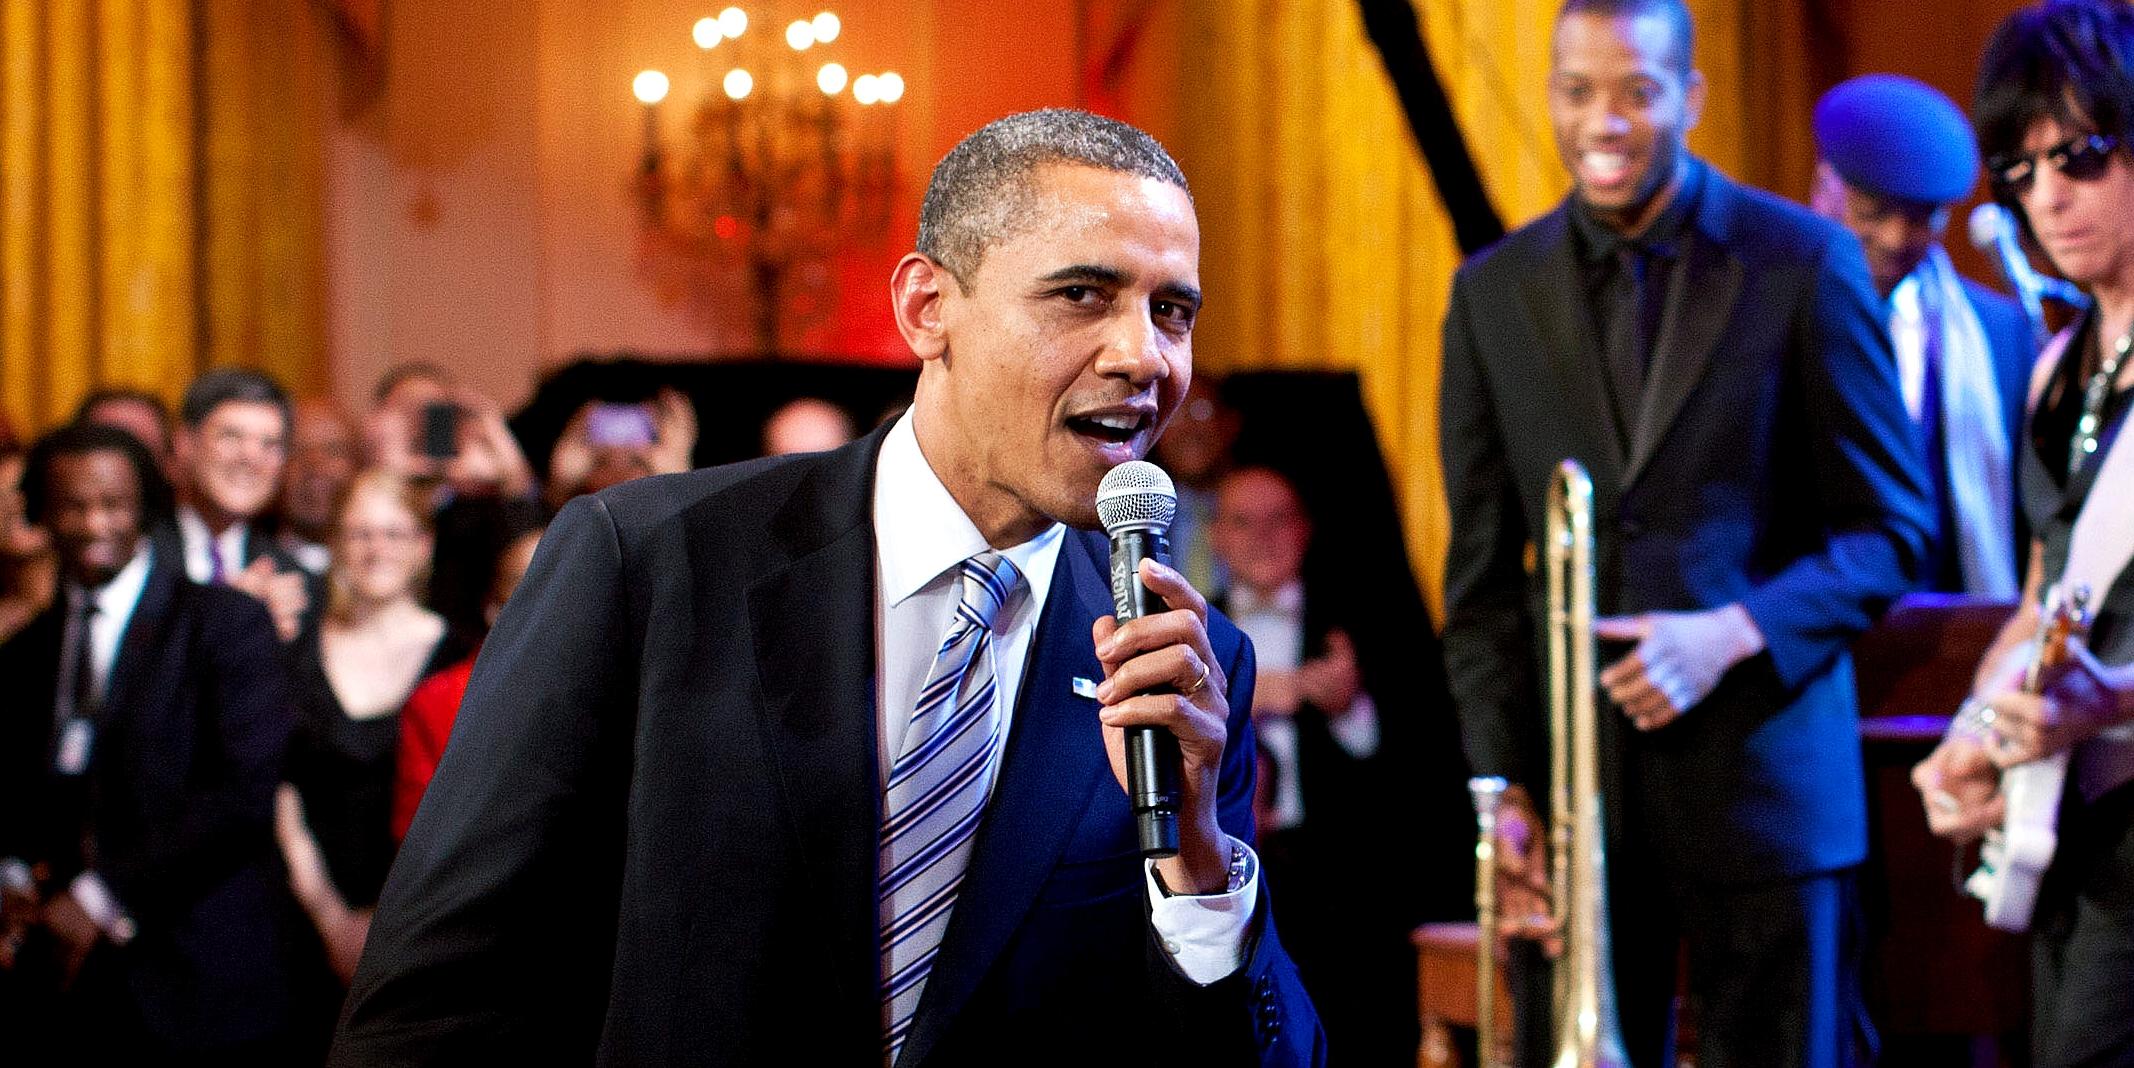 Resultado de imagen para obama playlist 2017